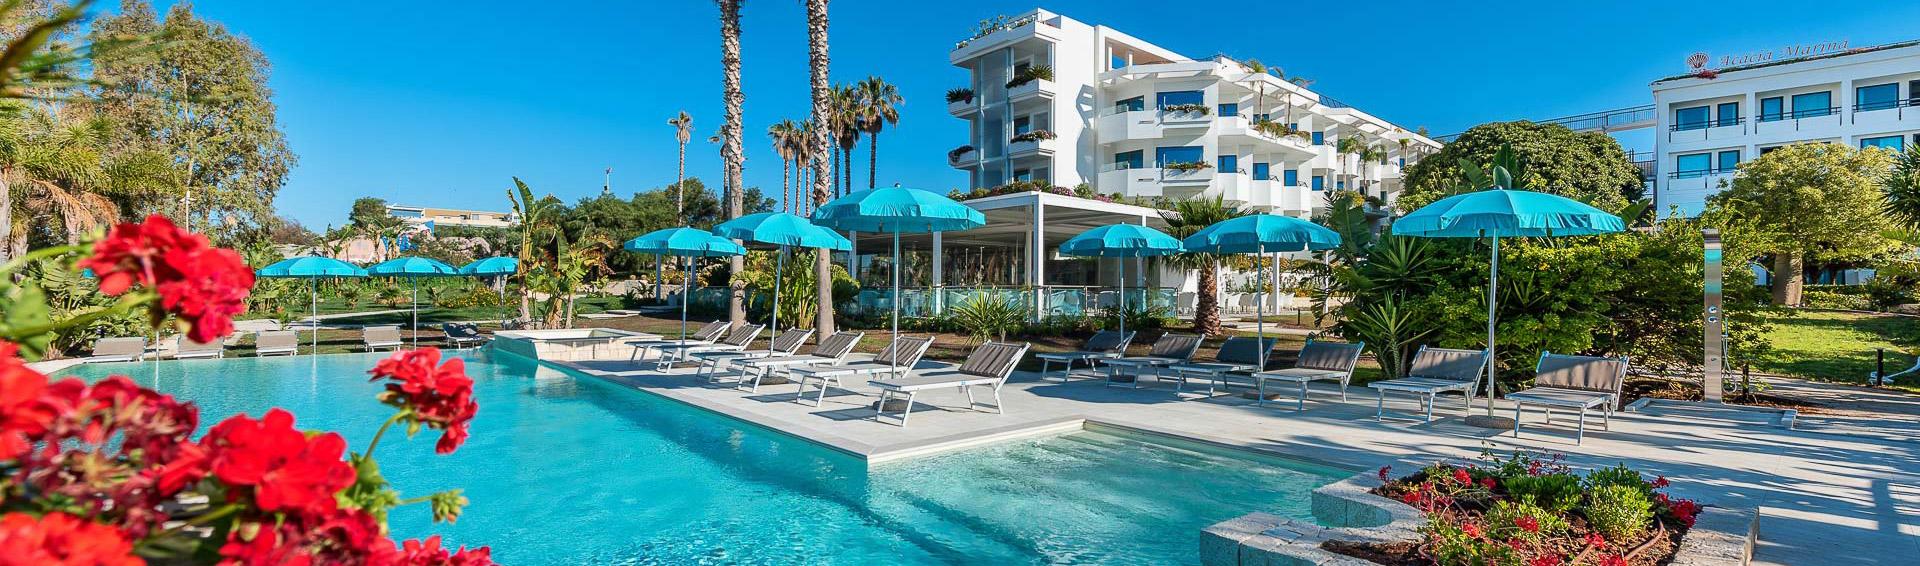 Hotel Marina di Ragusa - Acacia Palace